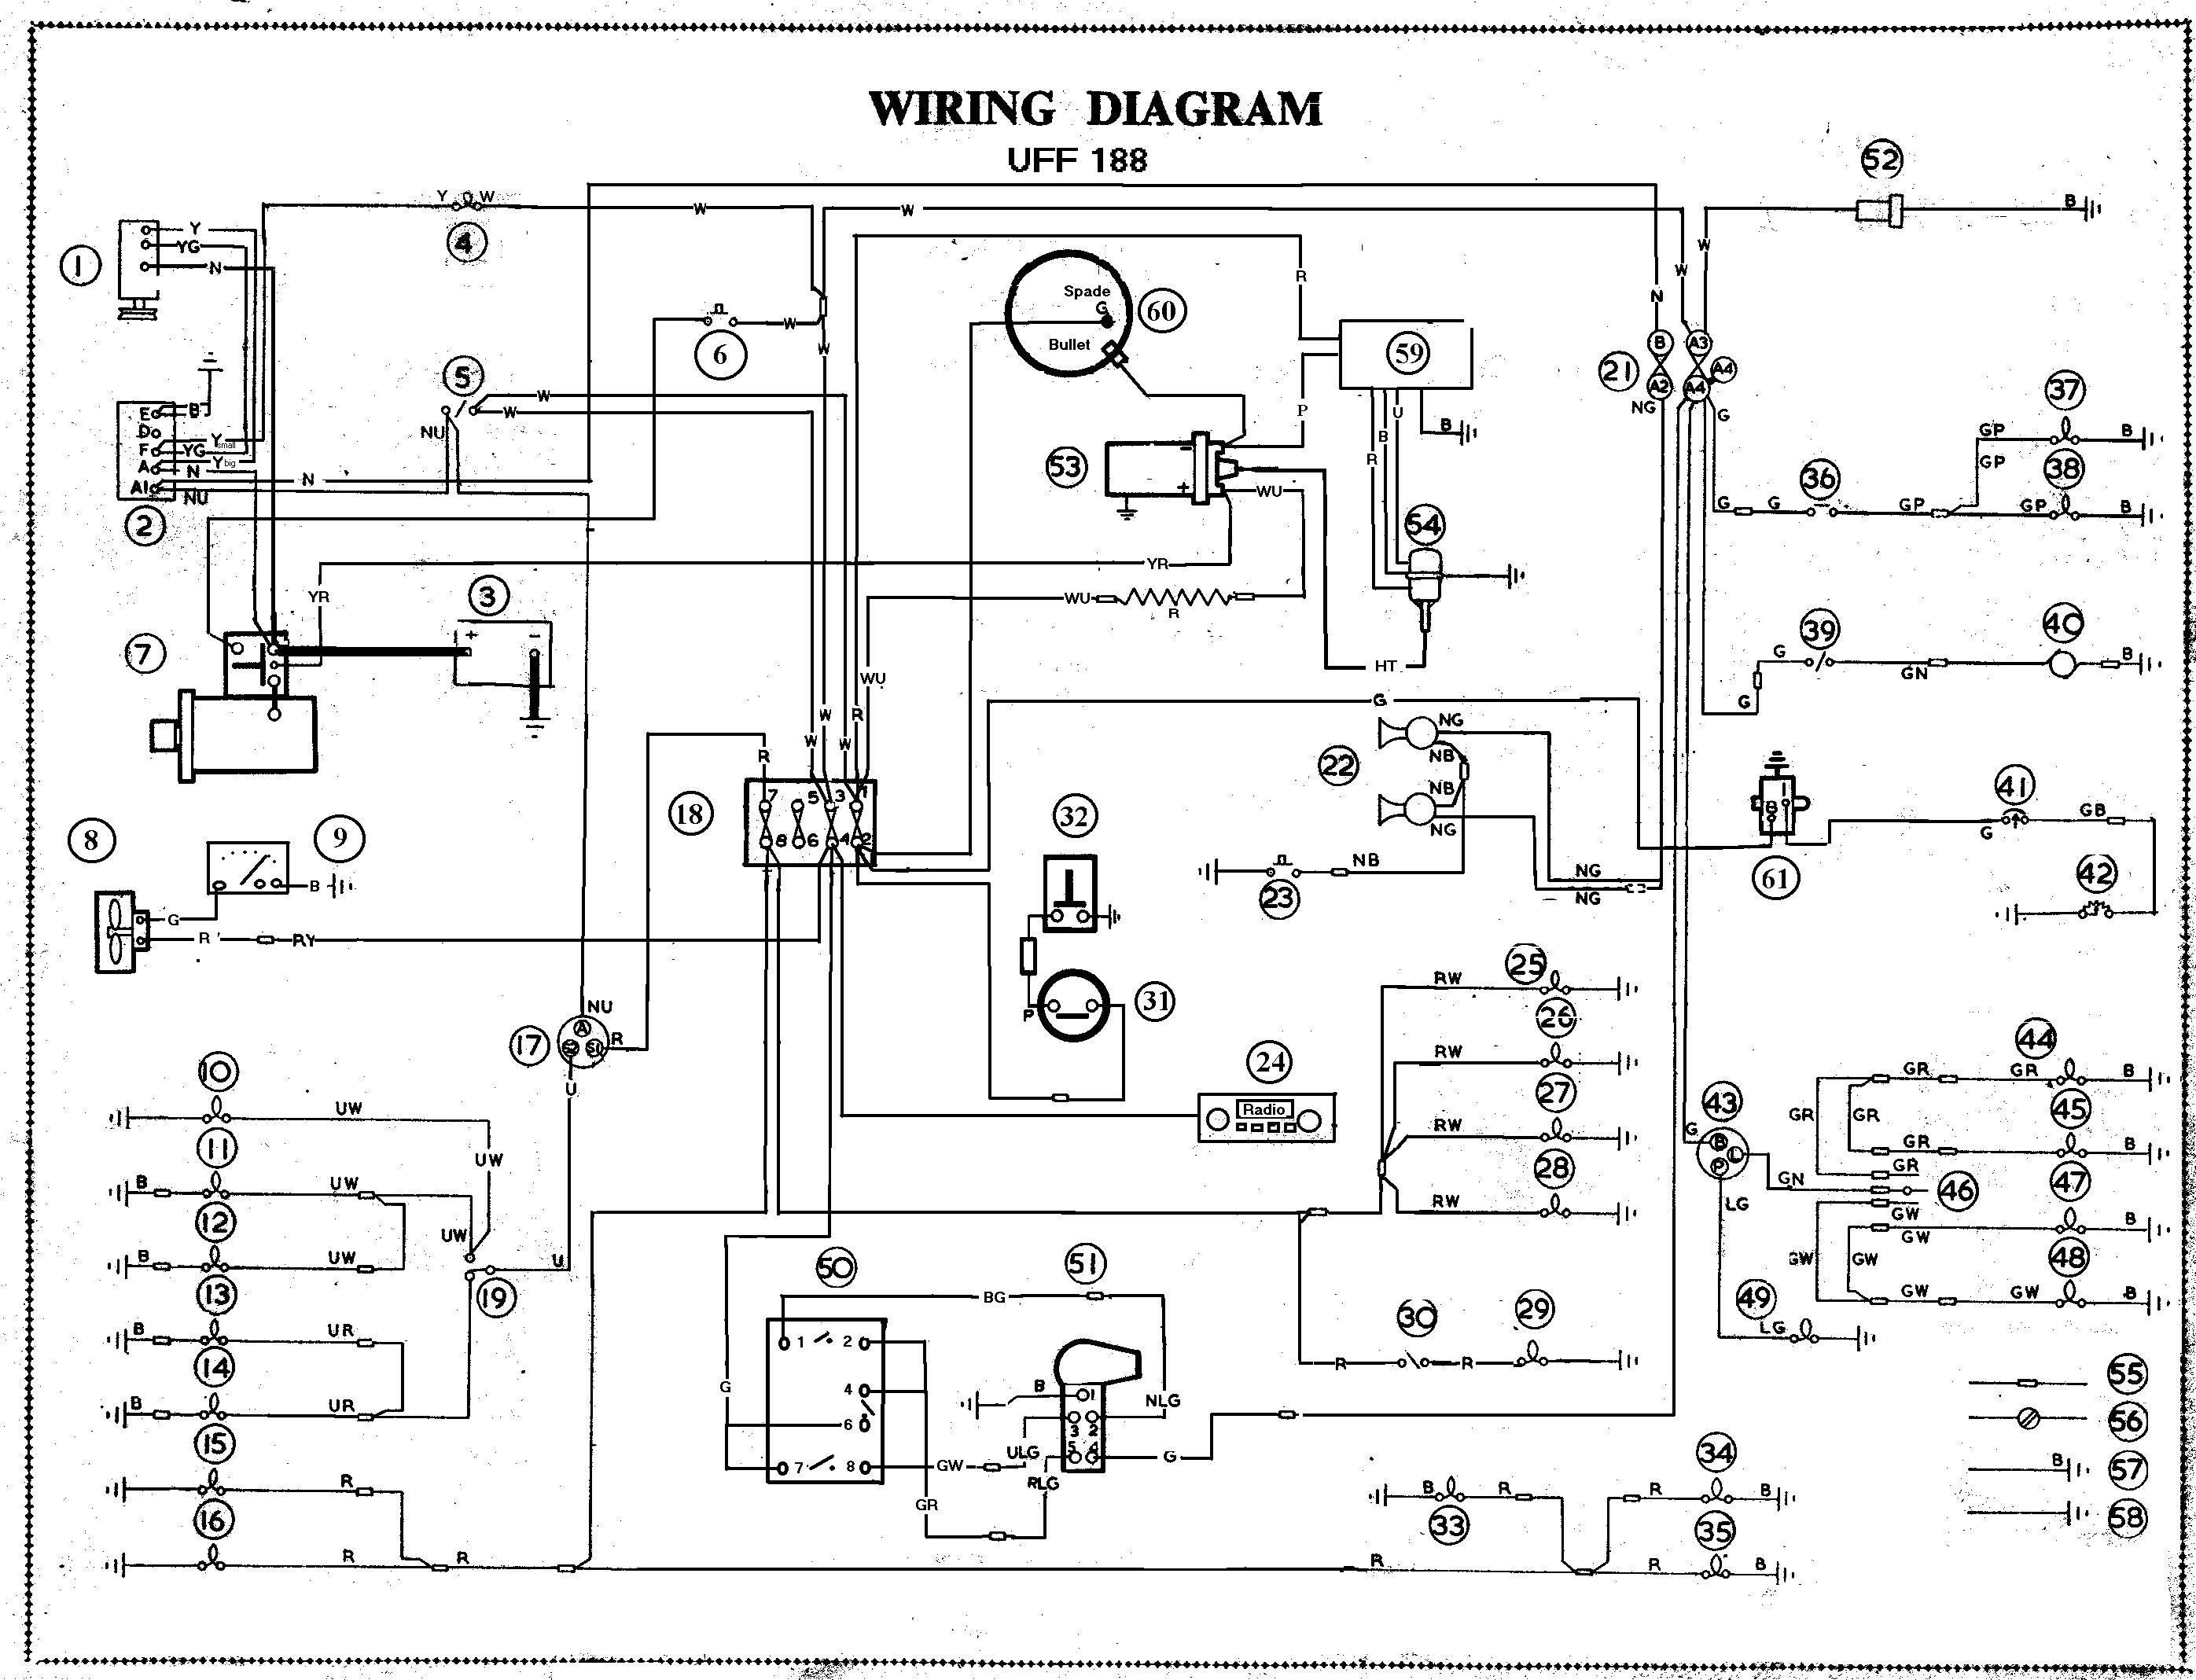 Car Wiring Diagrams | Schematic Diagram - Auto Wiring Diagram